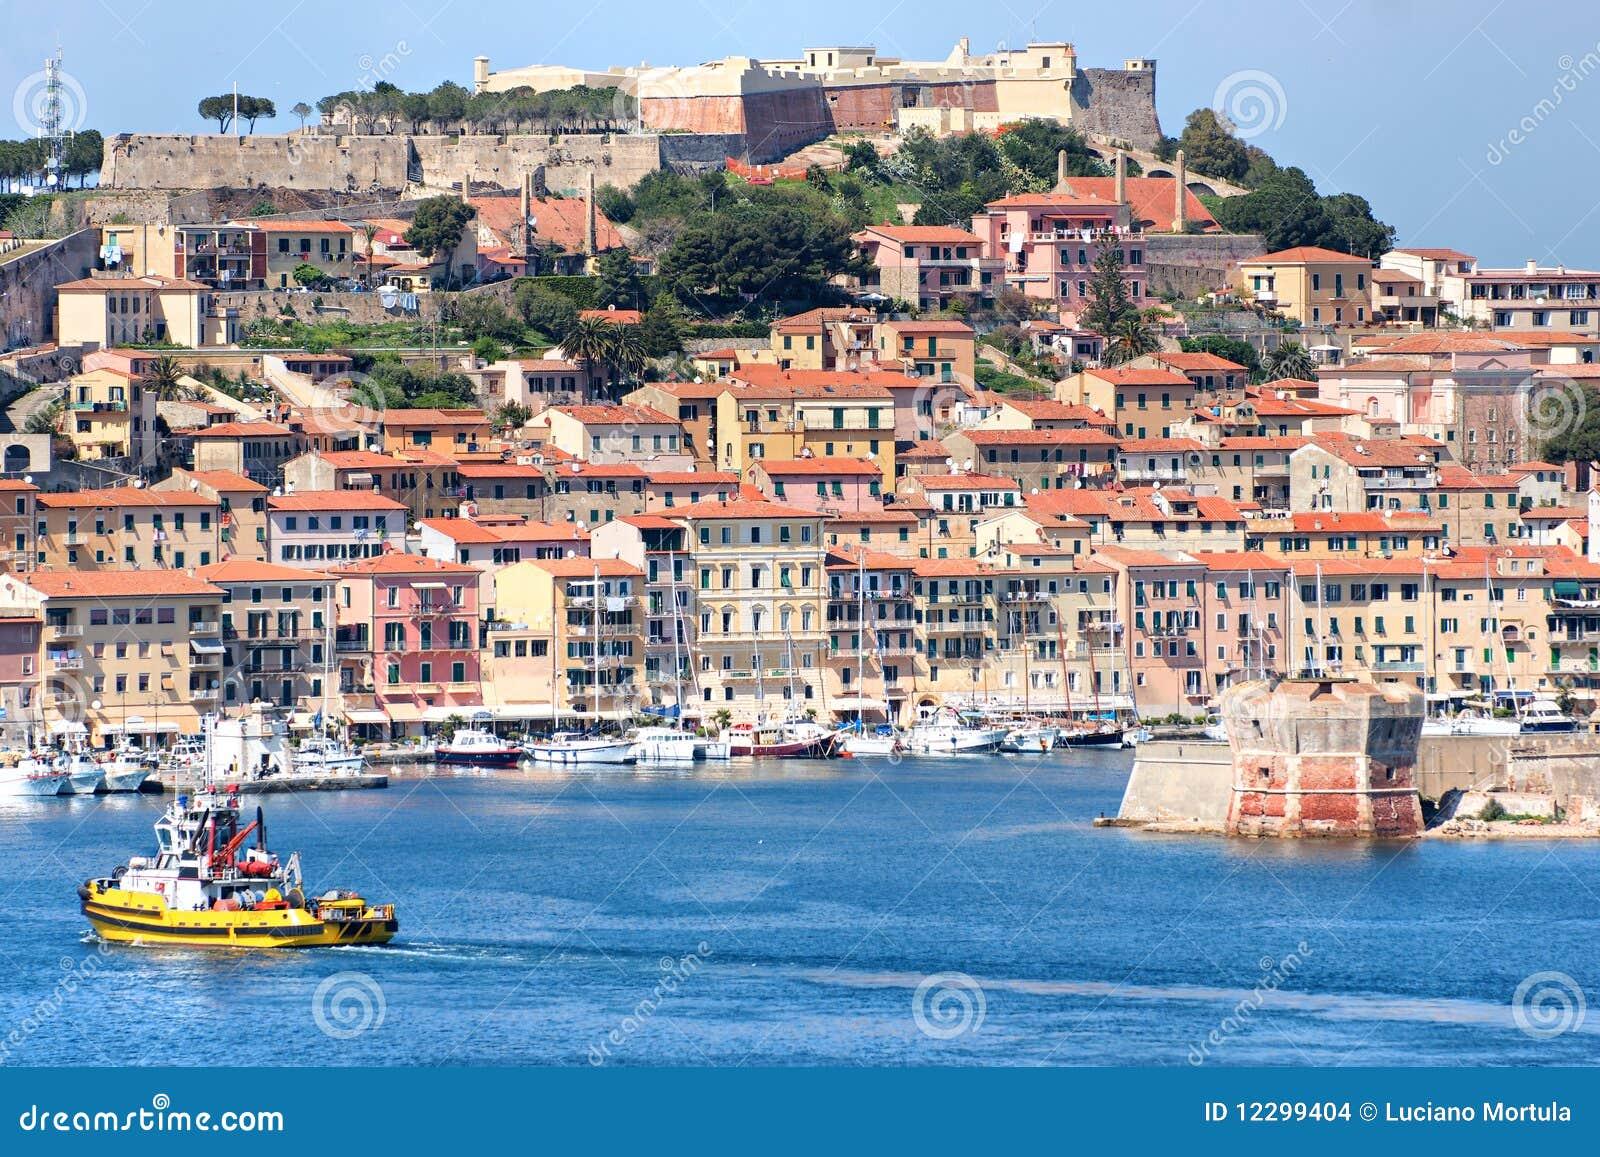 Portoferraio Italy  city pictures gallery : Portoferraio, Isle Of Elba, Italy. Stock Images Image: 12299404